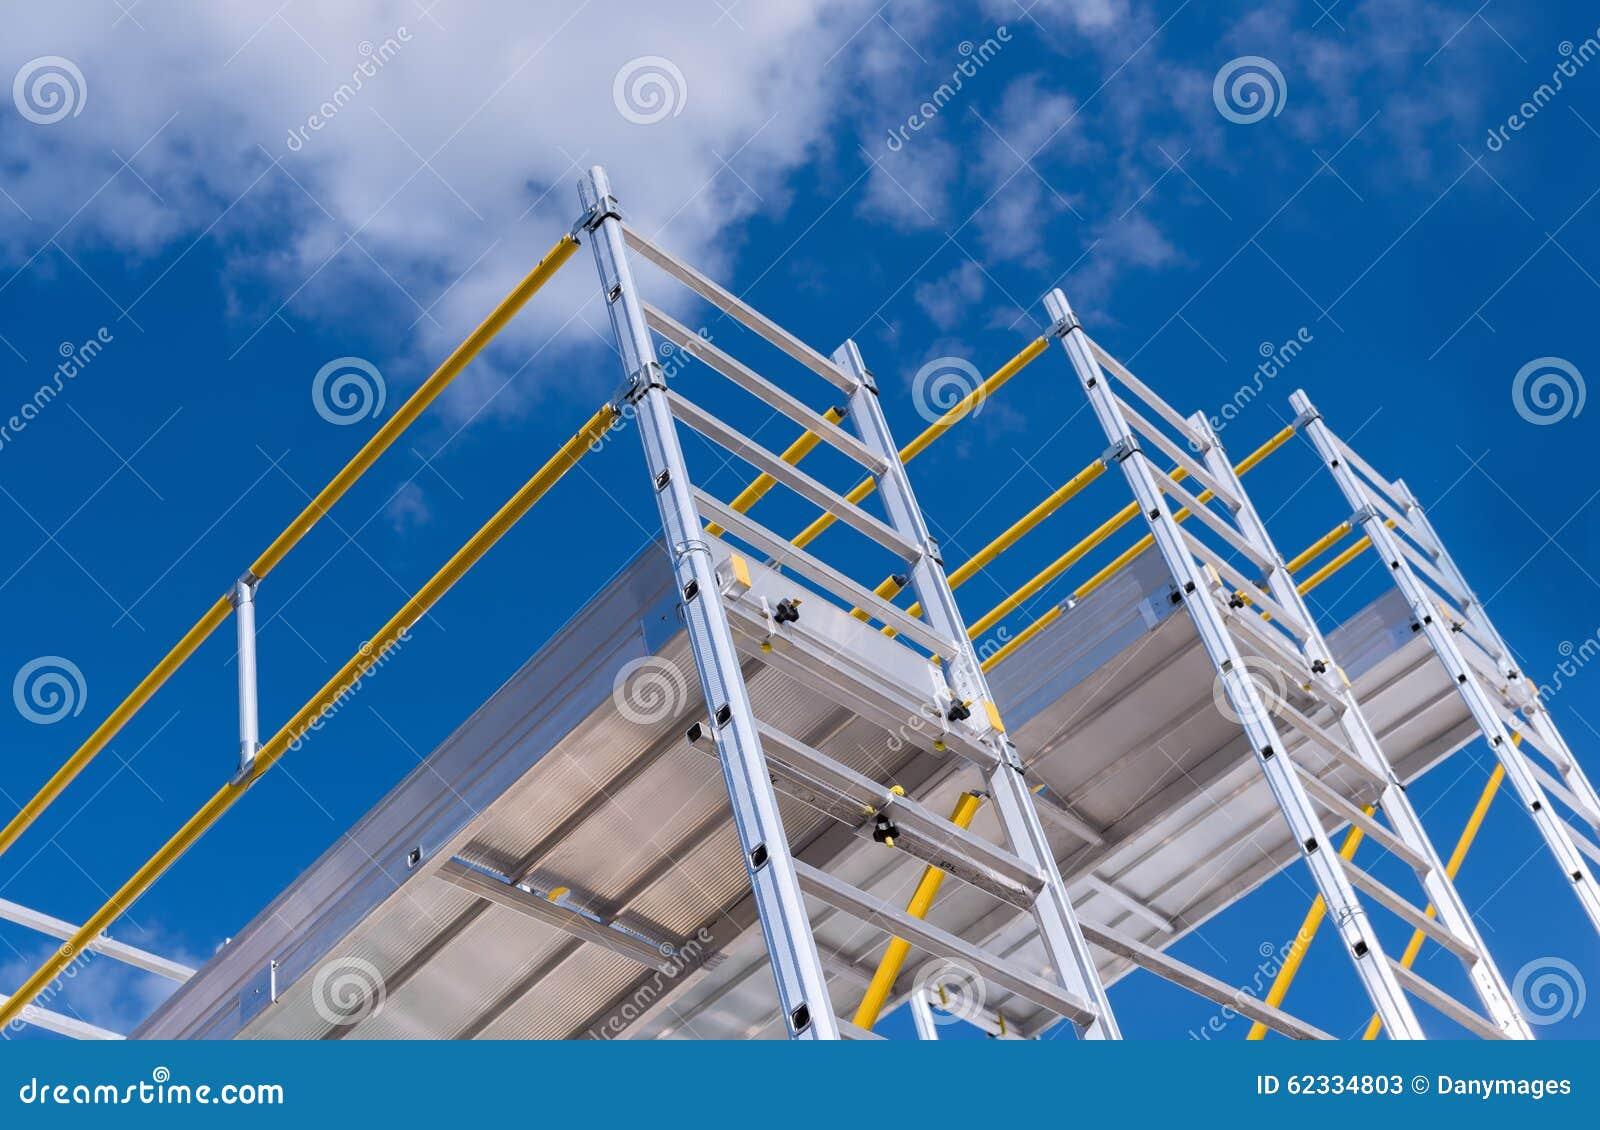 Scaffolding Stock Photo Image 62334803